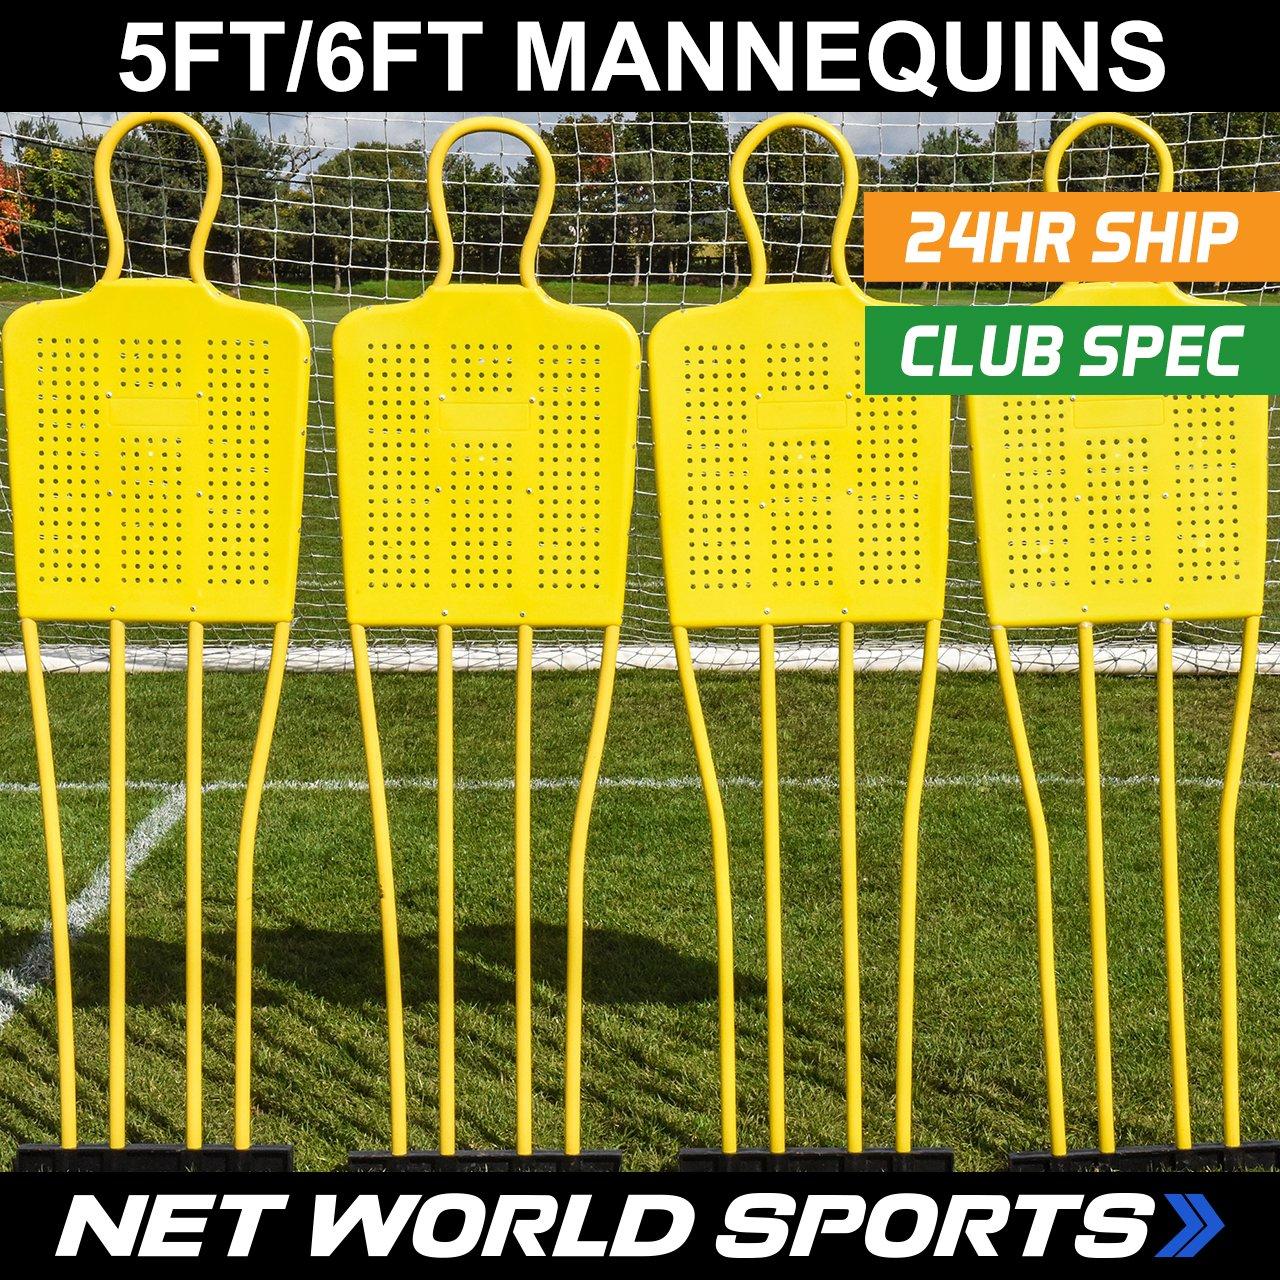 Forza Soccer Free Kick / Coaching Mannequin ( Junior / Seniorサイズ) (数量1または3 ) [ Net世界スポーツ] B01MFZZA68Junior (5ft 4in) 3 Pack